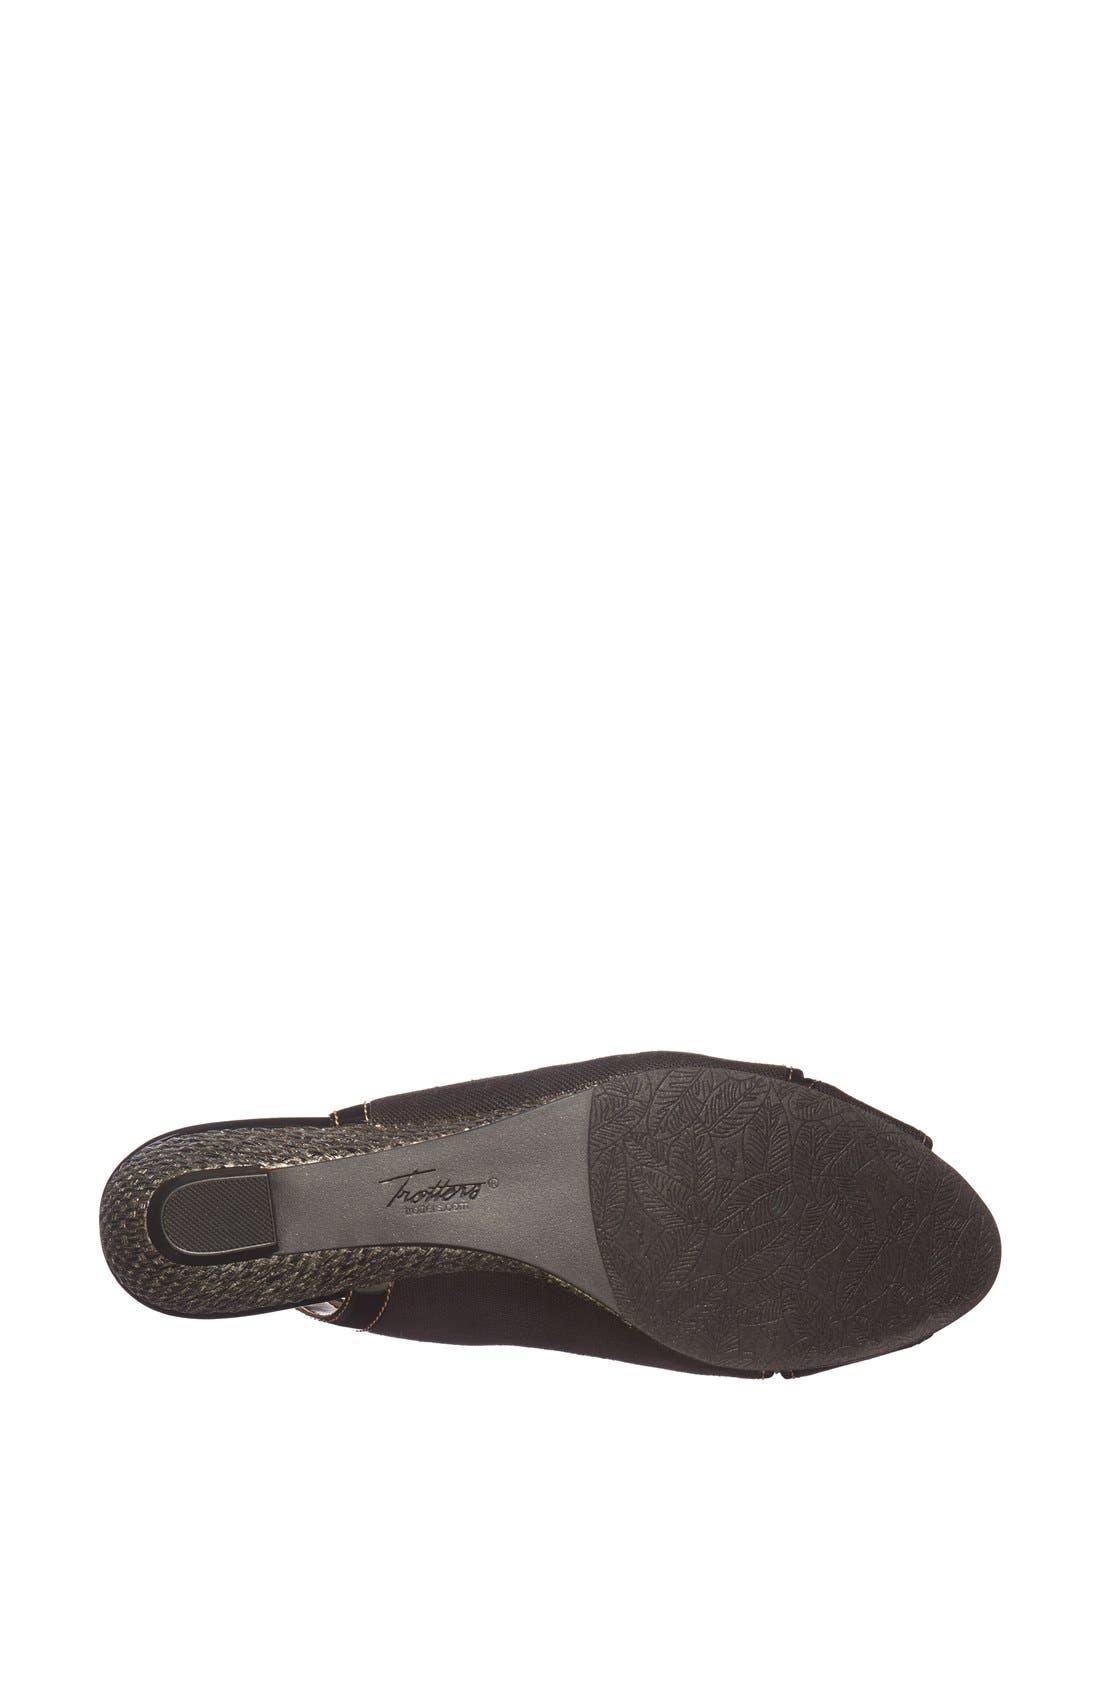 Alternate Image 4  - Trotters 'Calle' Slingback Sandal